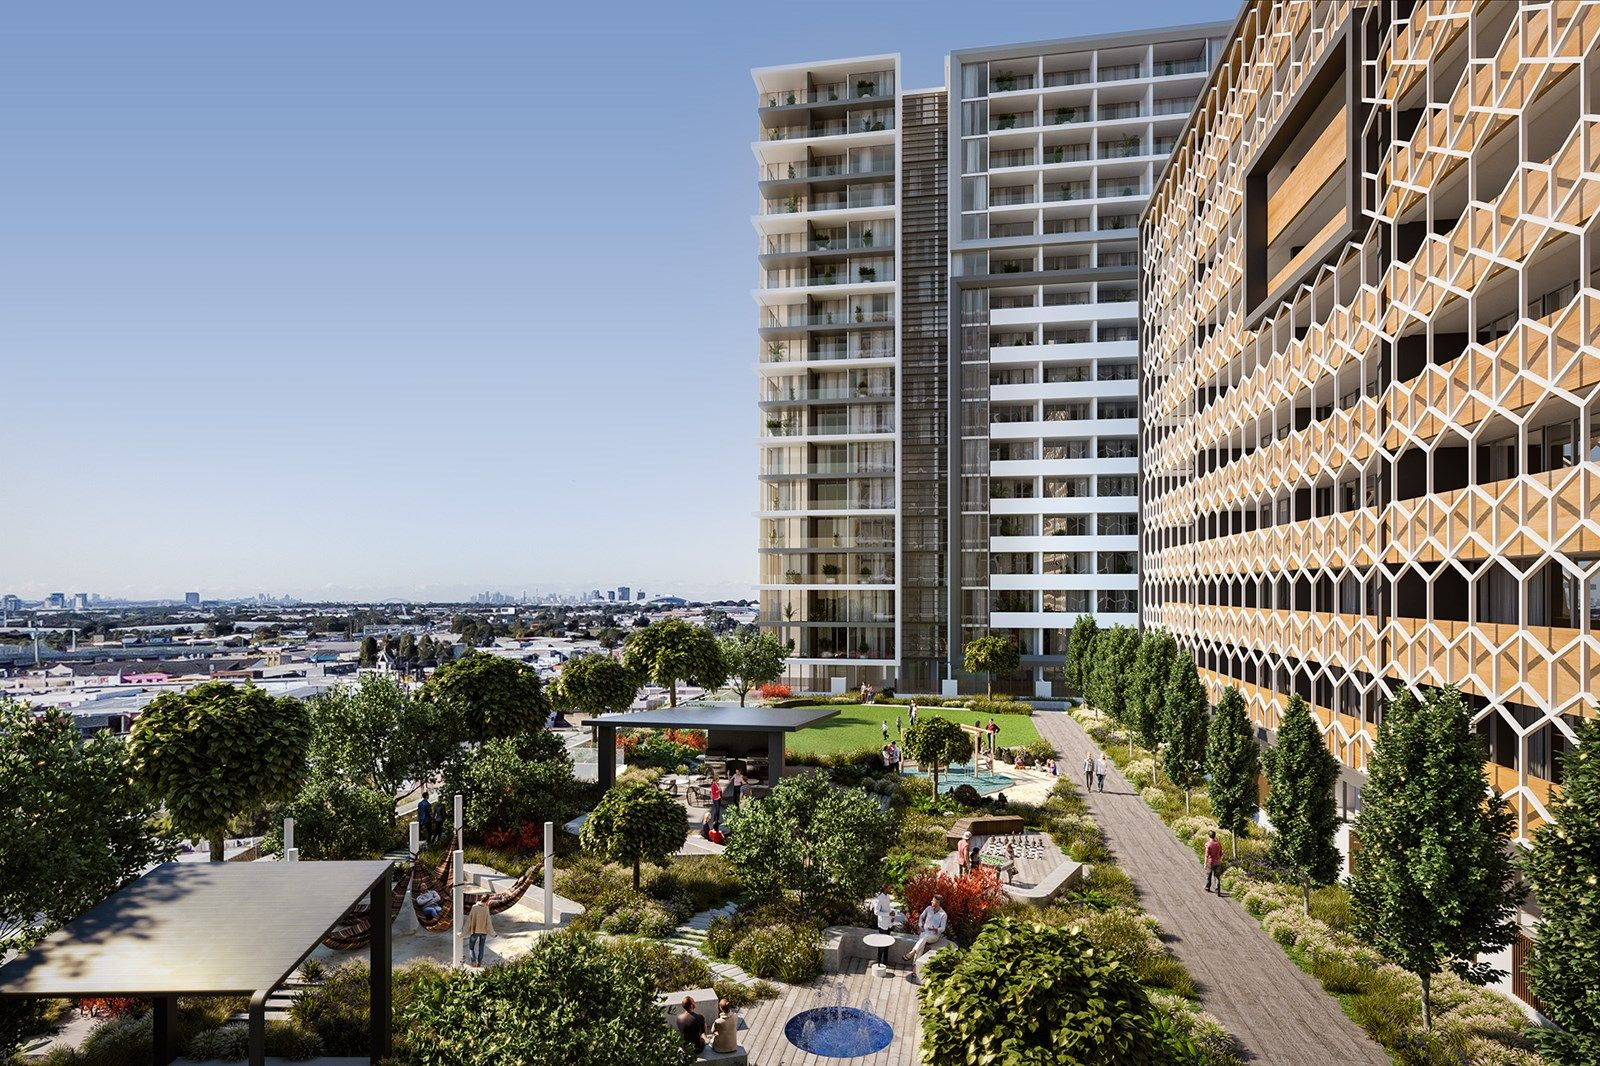 38 Cowper Street, Granville, NSW 2142, Image 0